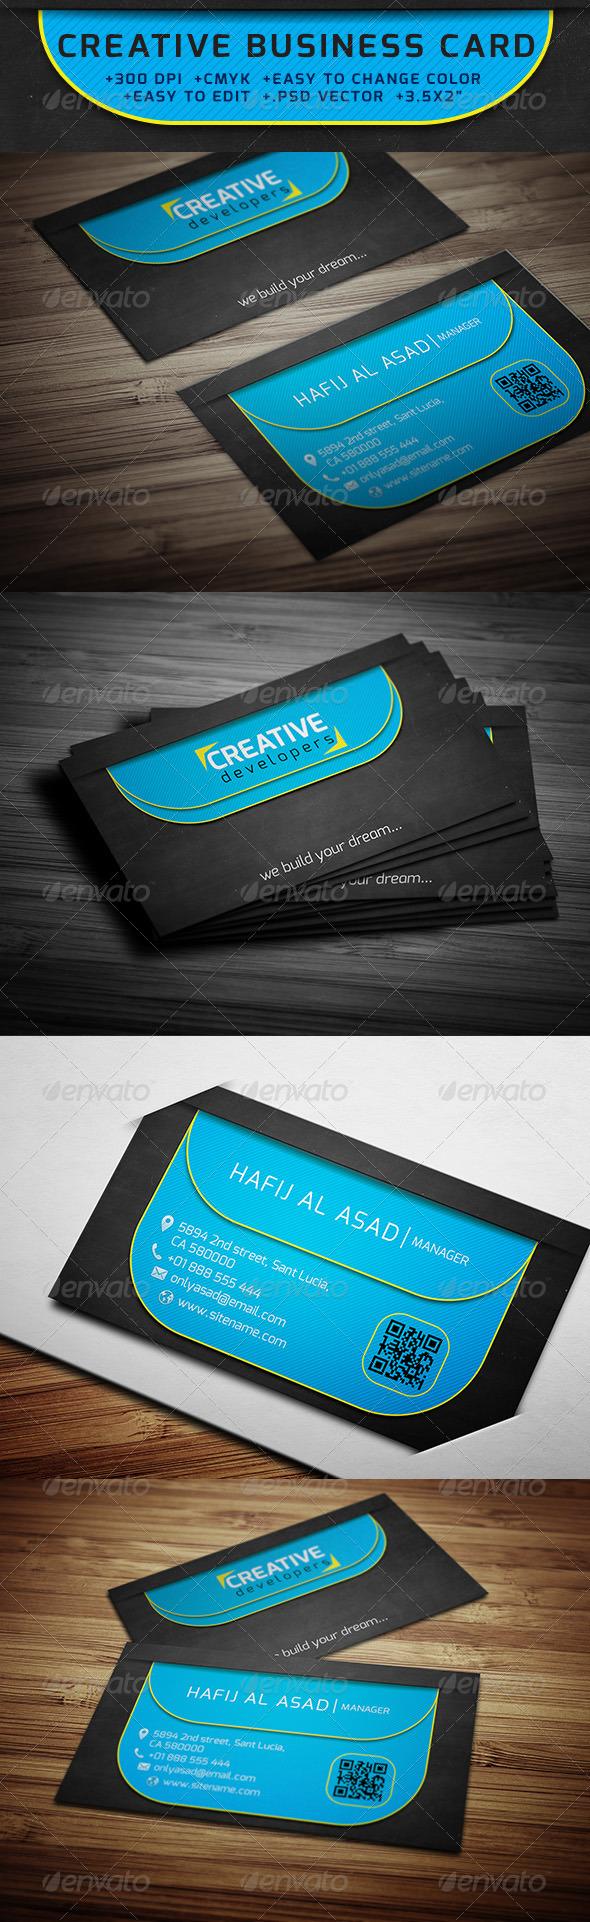 GraphicRiver Creative Business Card 6339121